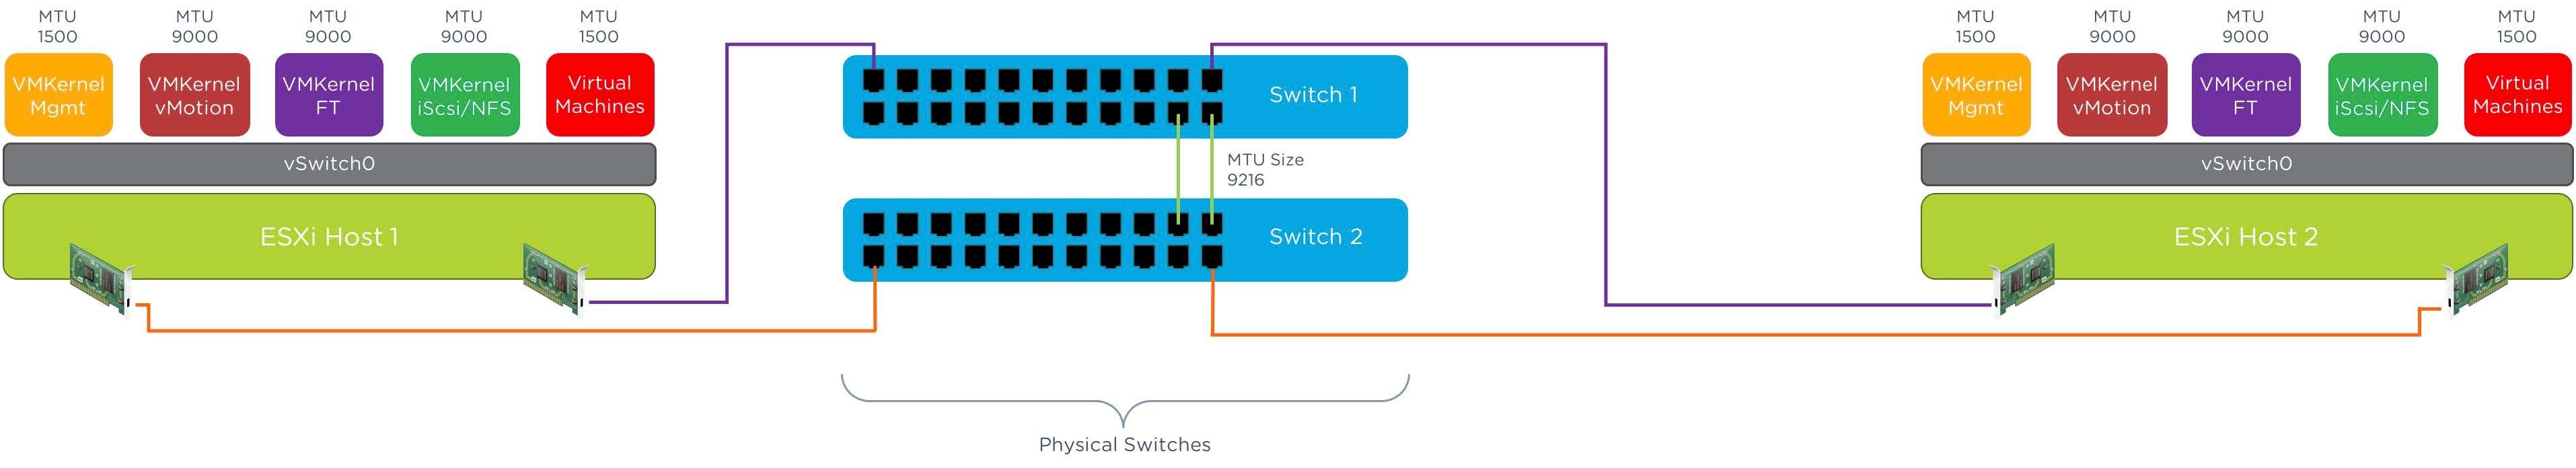 Nutanix, VMware Networking, and Jumbo Frames | Nutanix Community